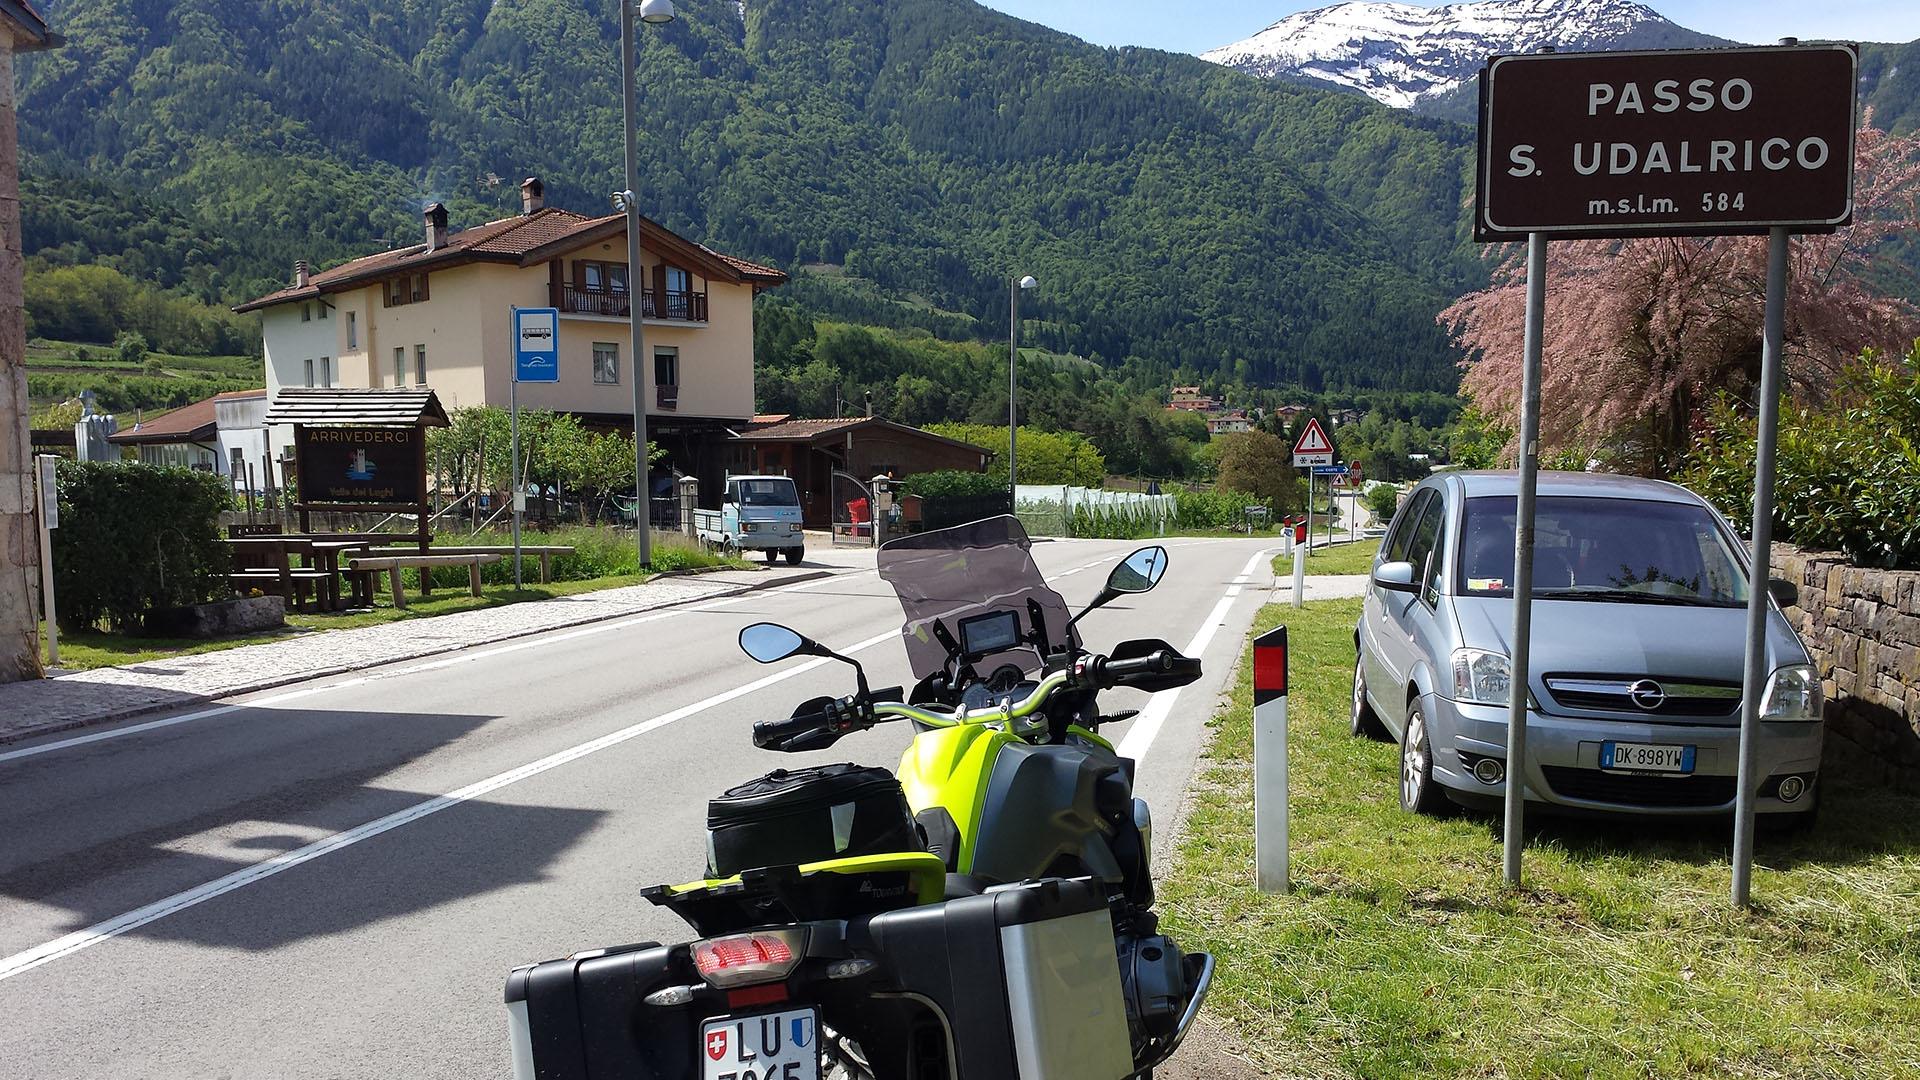 0584 - I - Passo San Udalrico